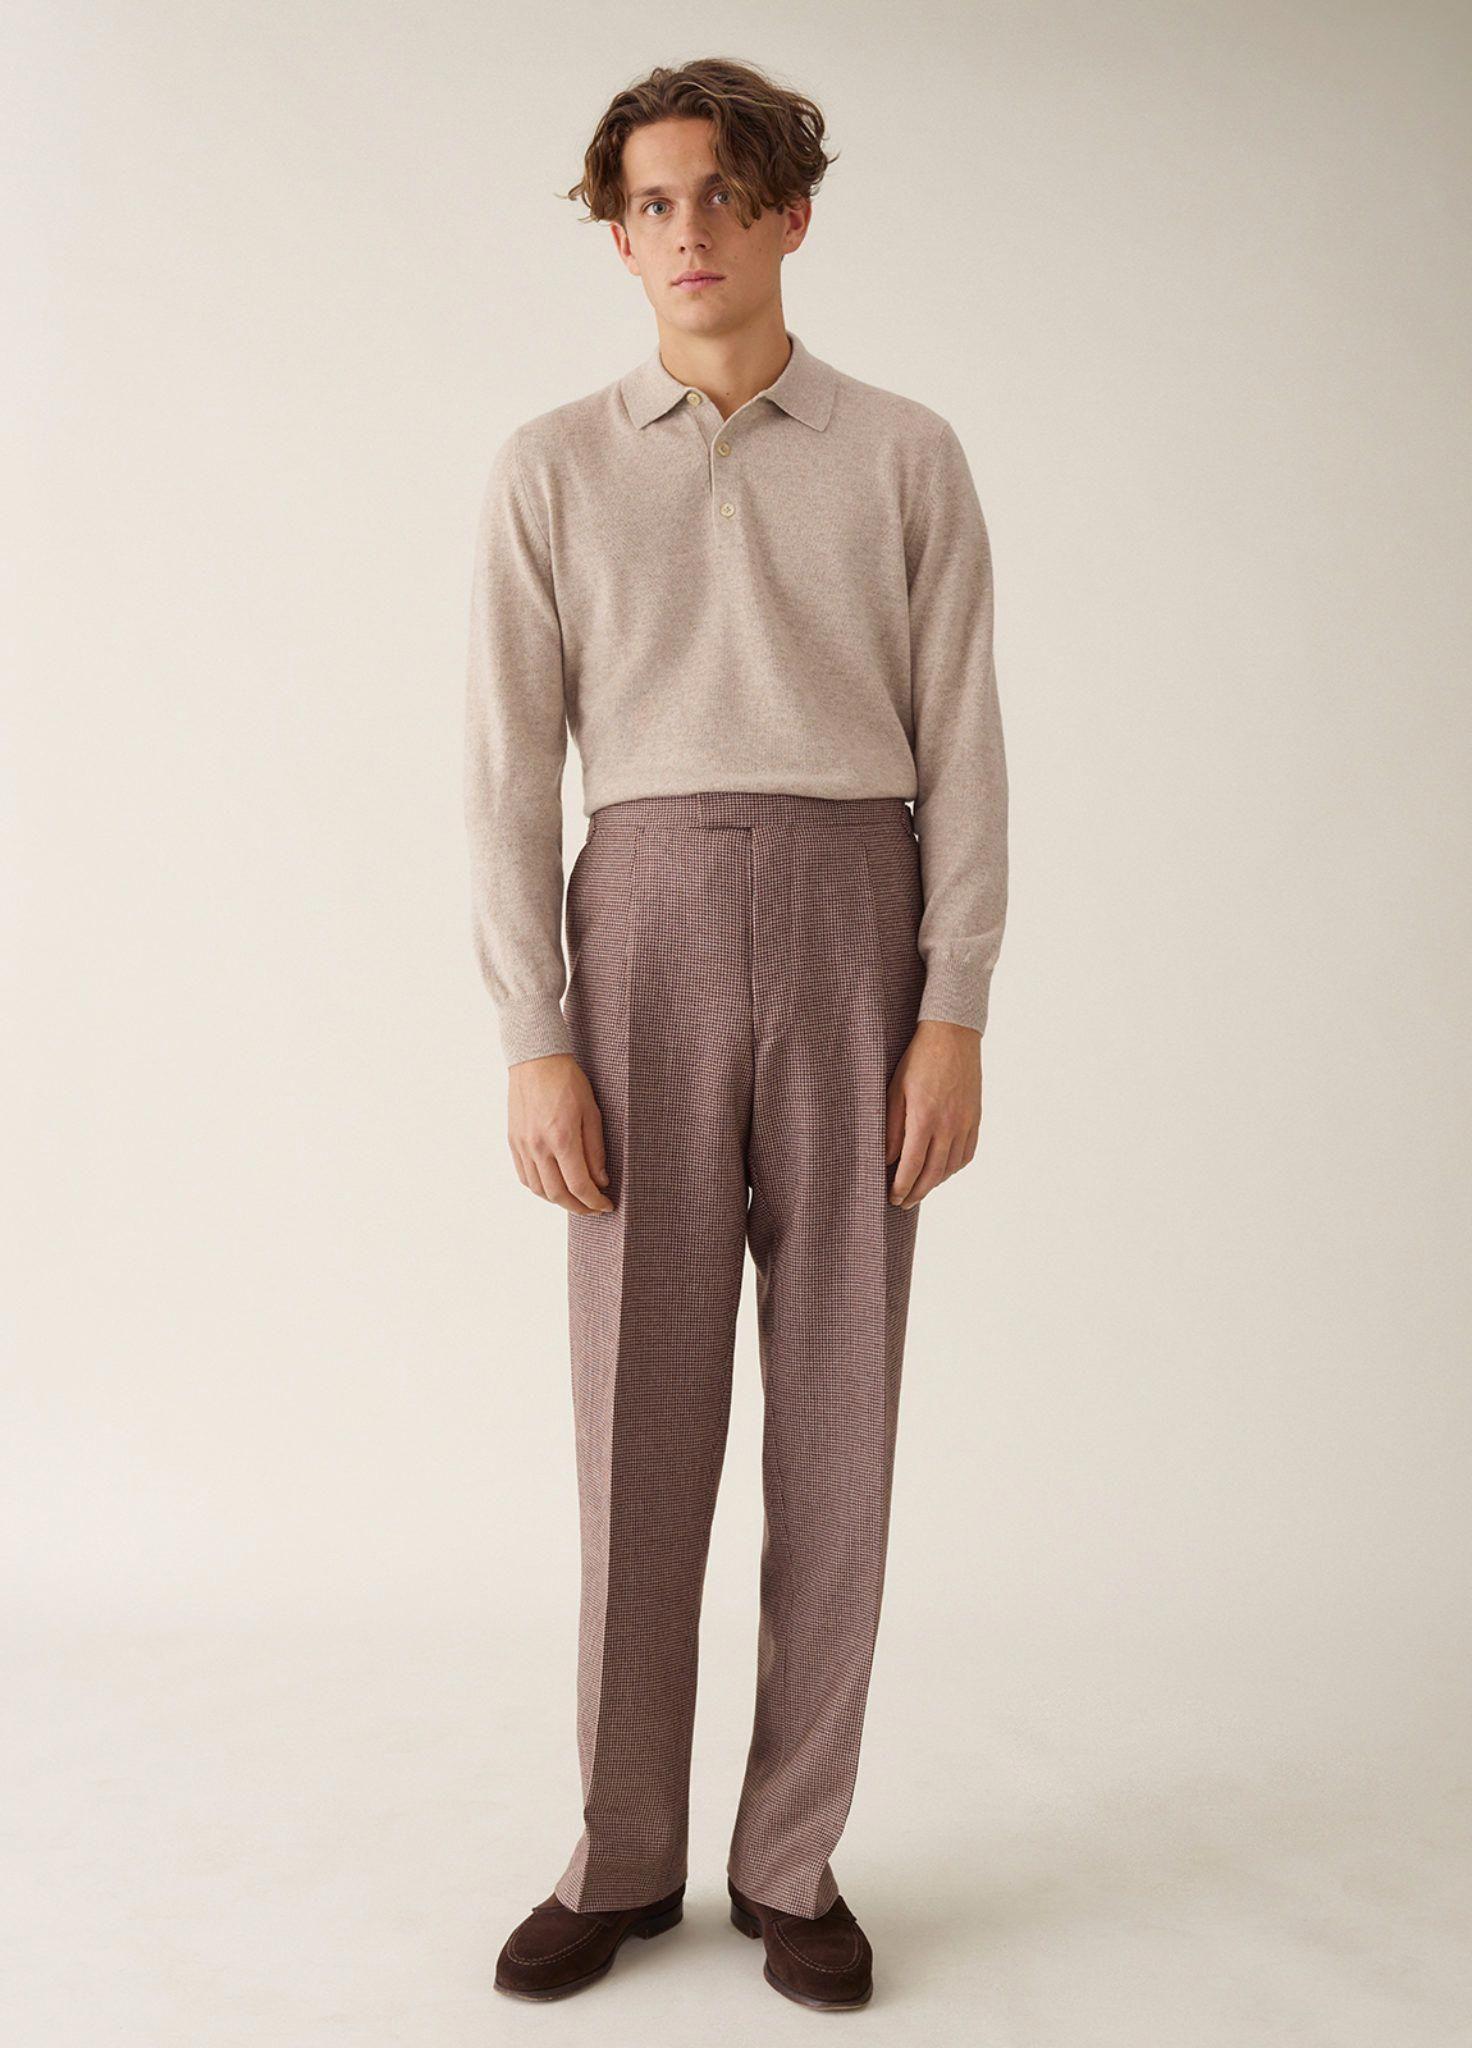 loungewear-ellemanstylecalendar-0821-glamour.jpg